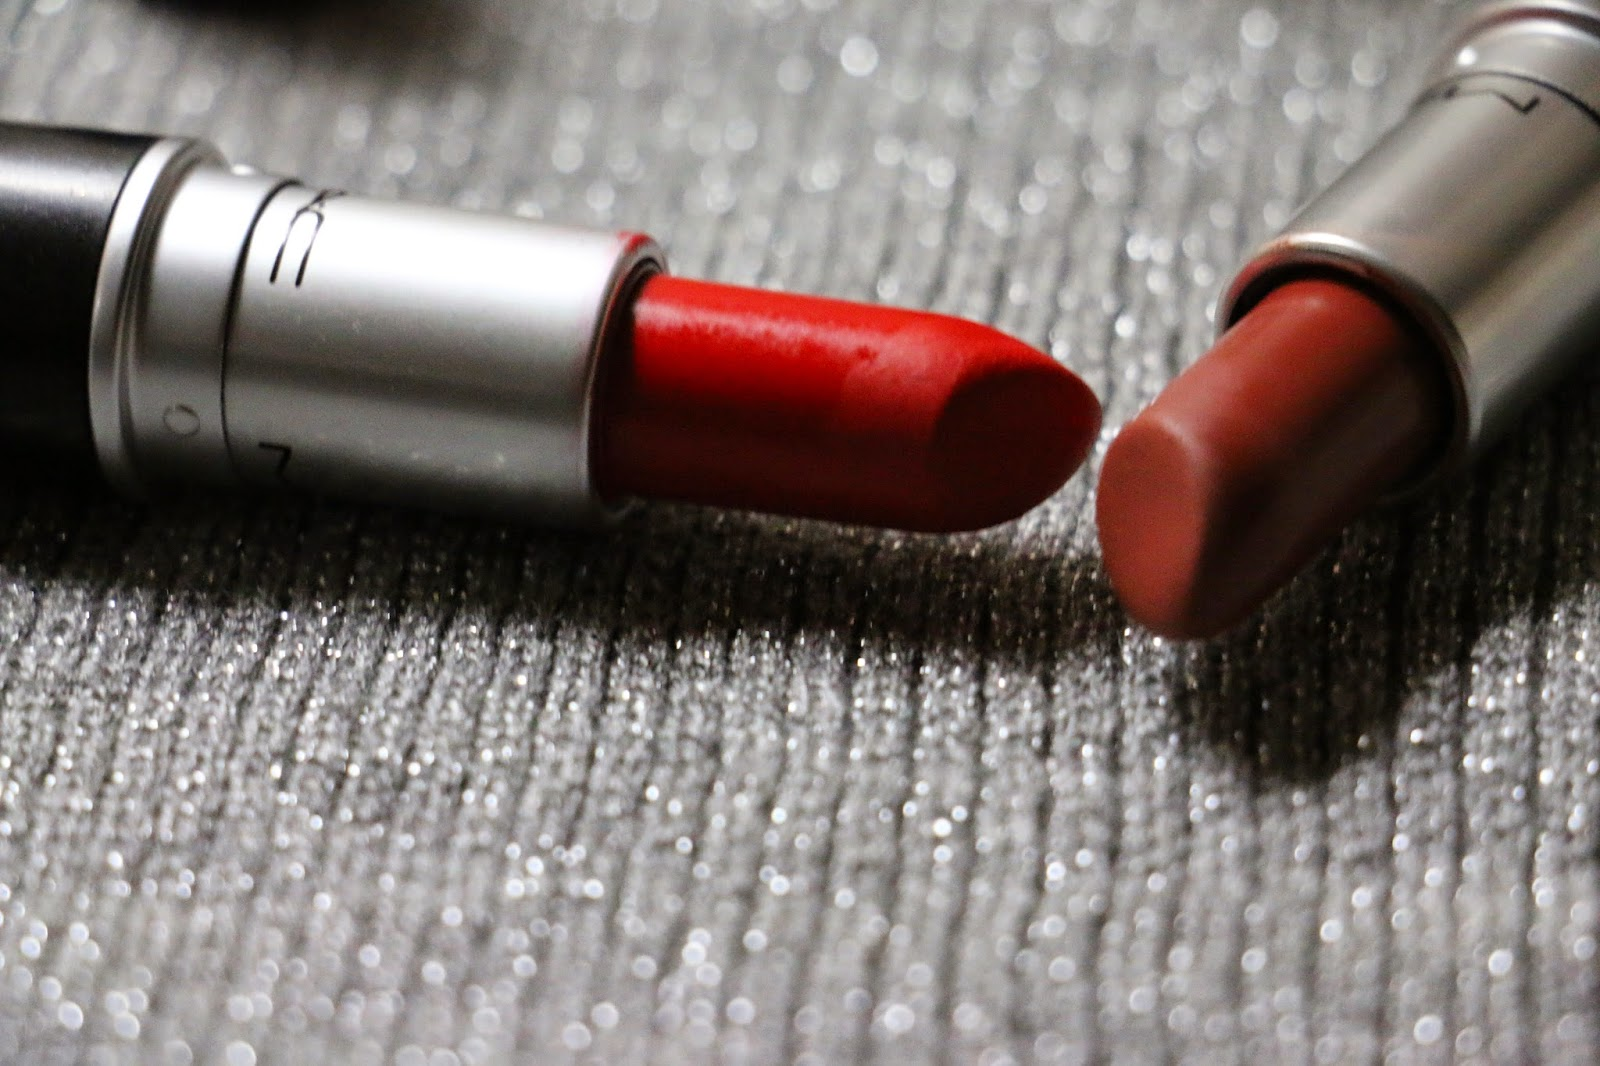 turkish youtuber - güzellik blogları - makyaj blogları -mac lady danger -flormar lip balm - burts bees - mac pander me - ruj bağımlısı - tag videoları -  addicted to lipstick